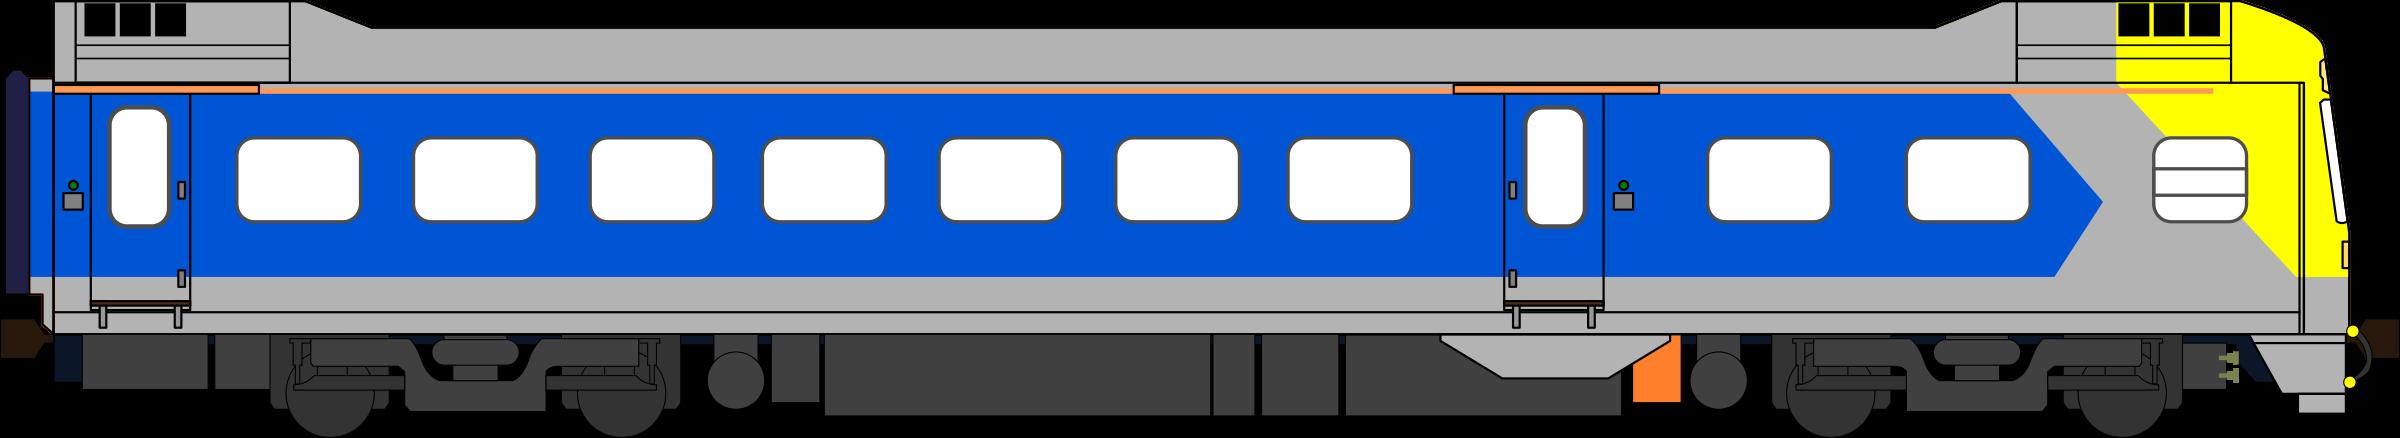 Clipart train commuter train. Ktm class big image